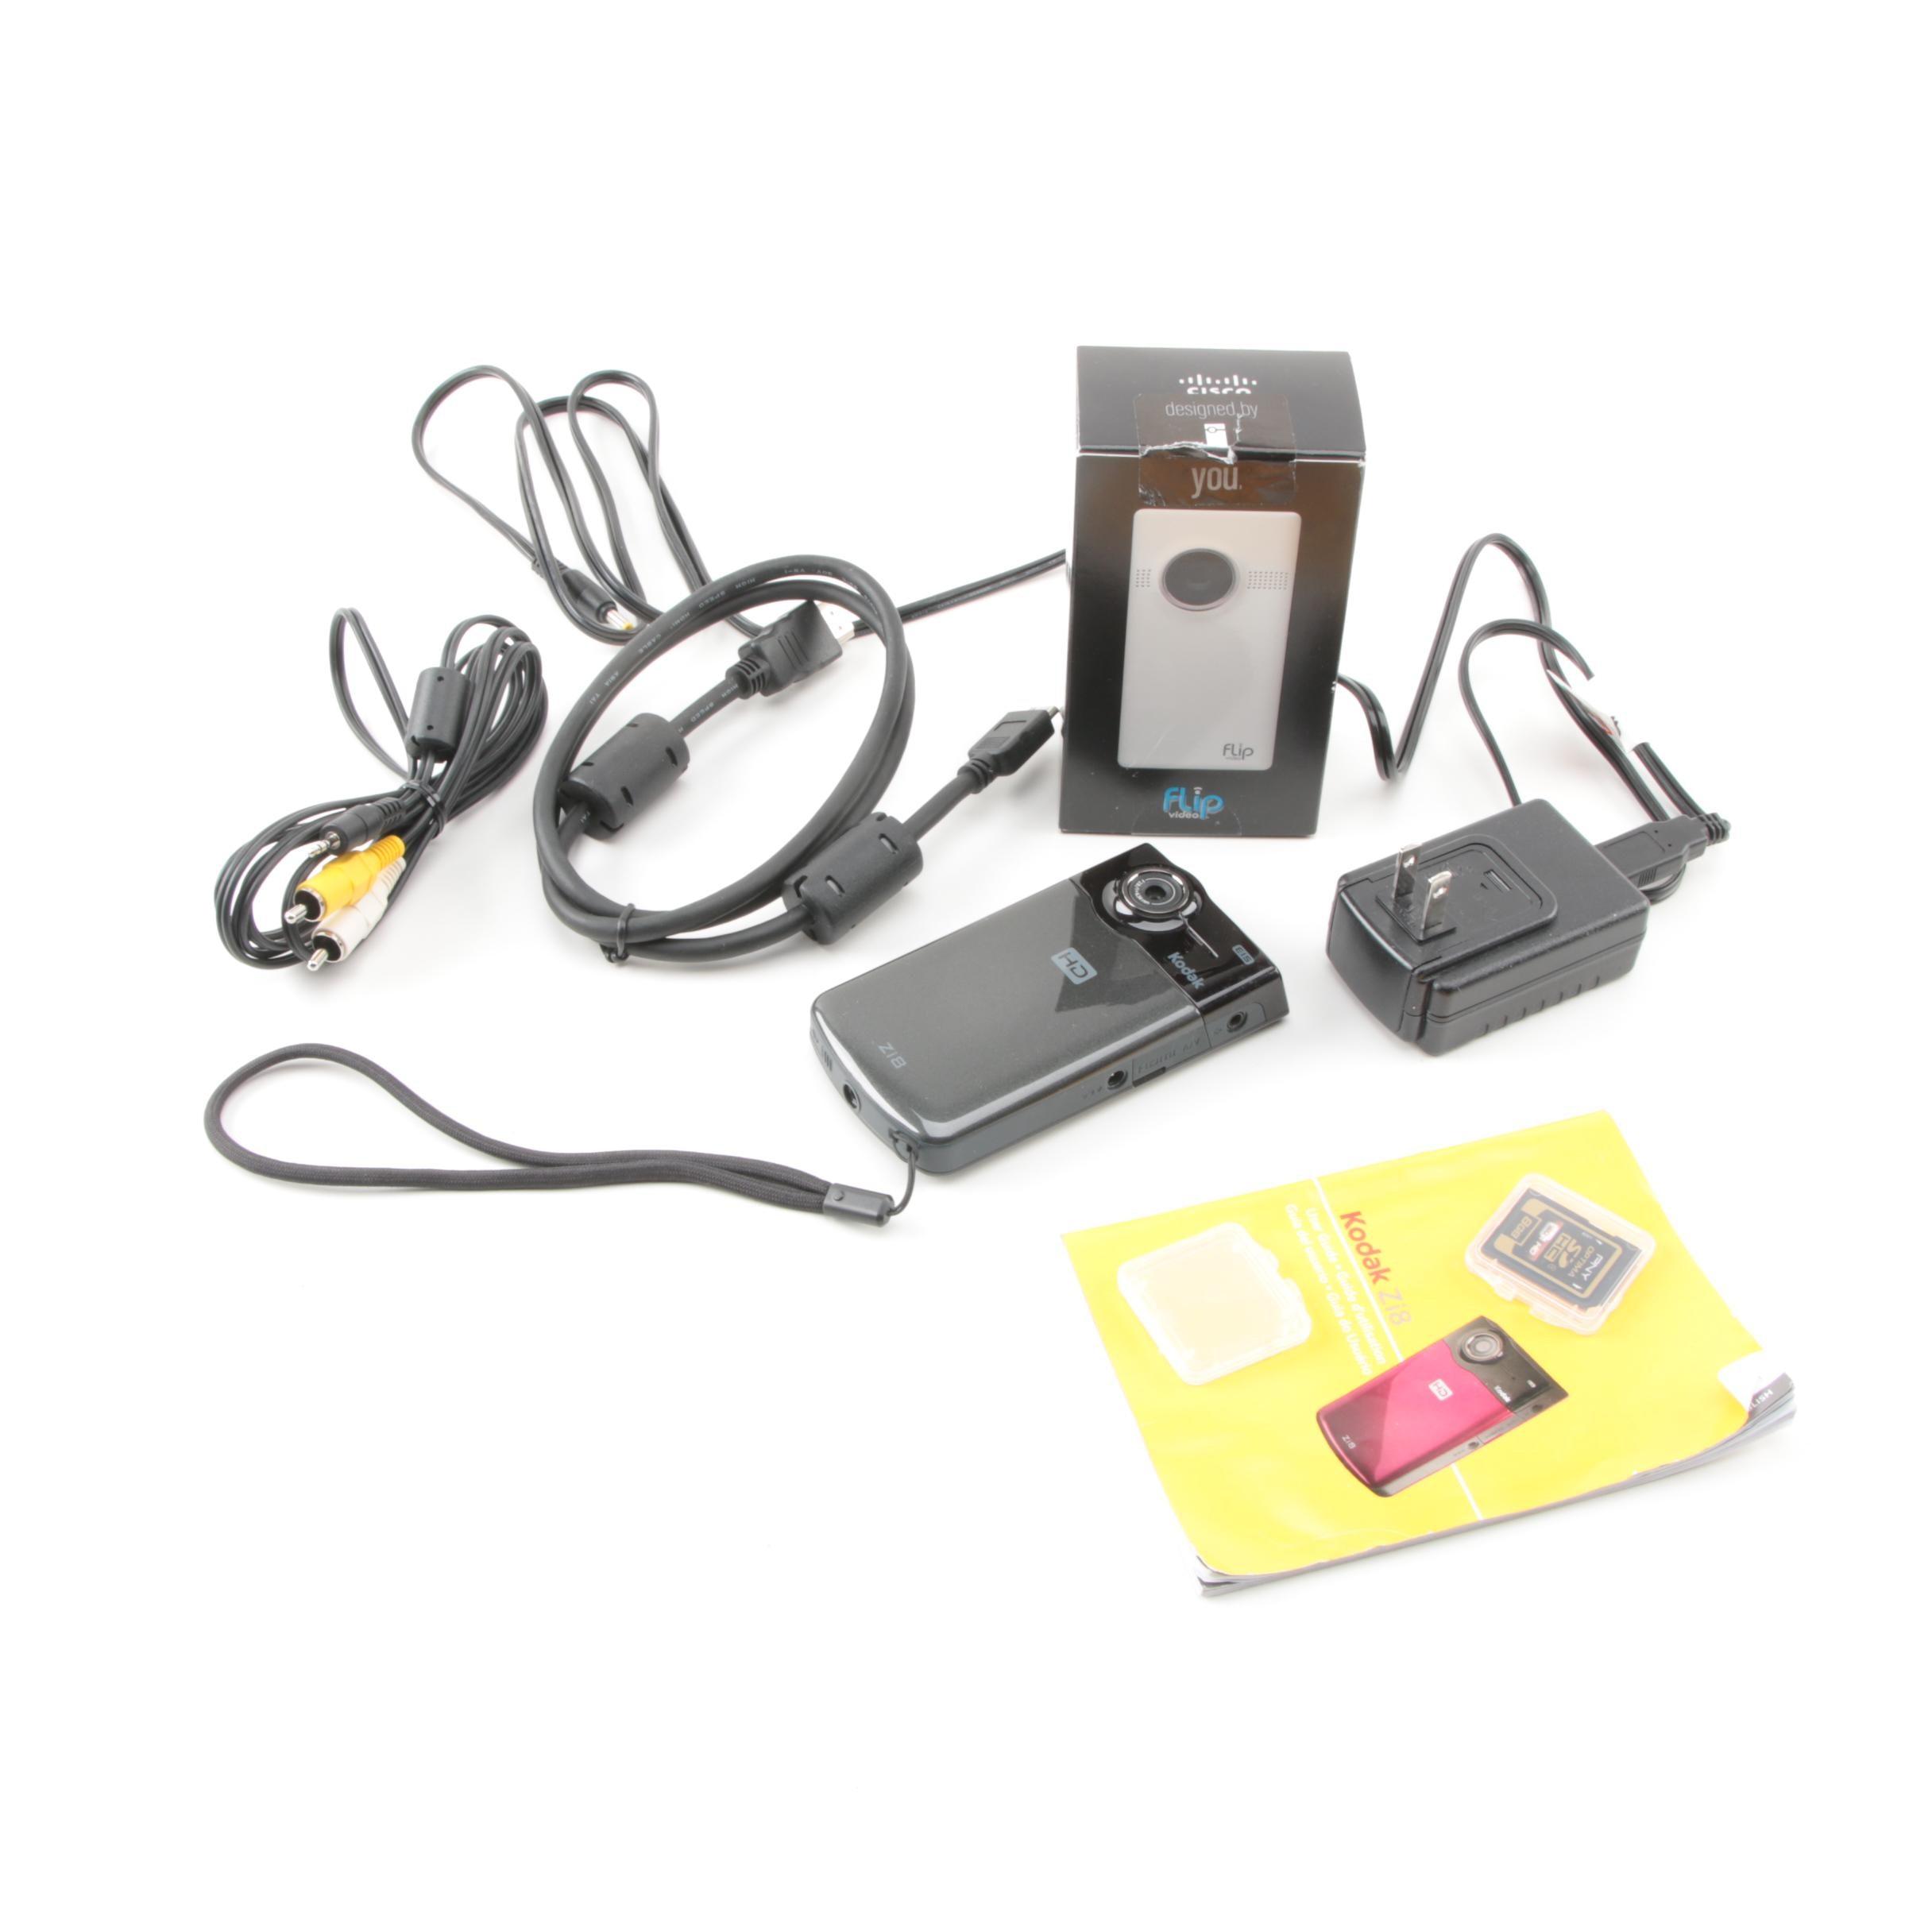 Kodak Zi8 and Flip MinoHD Video Cameras with Accessories